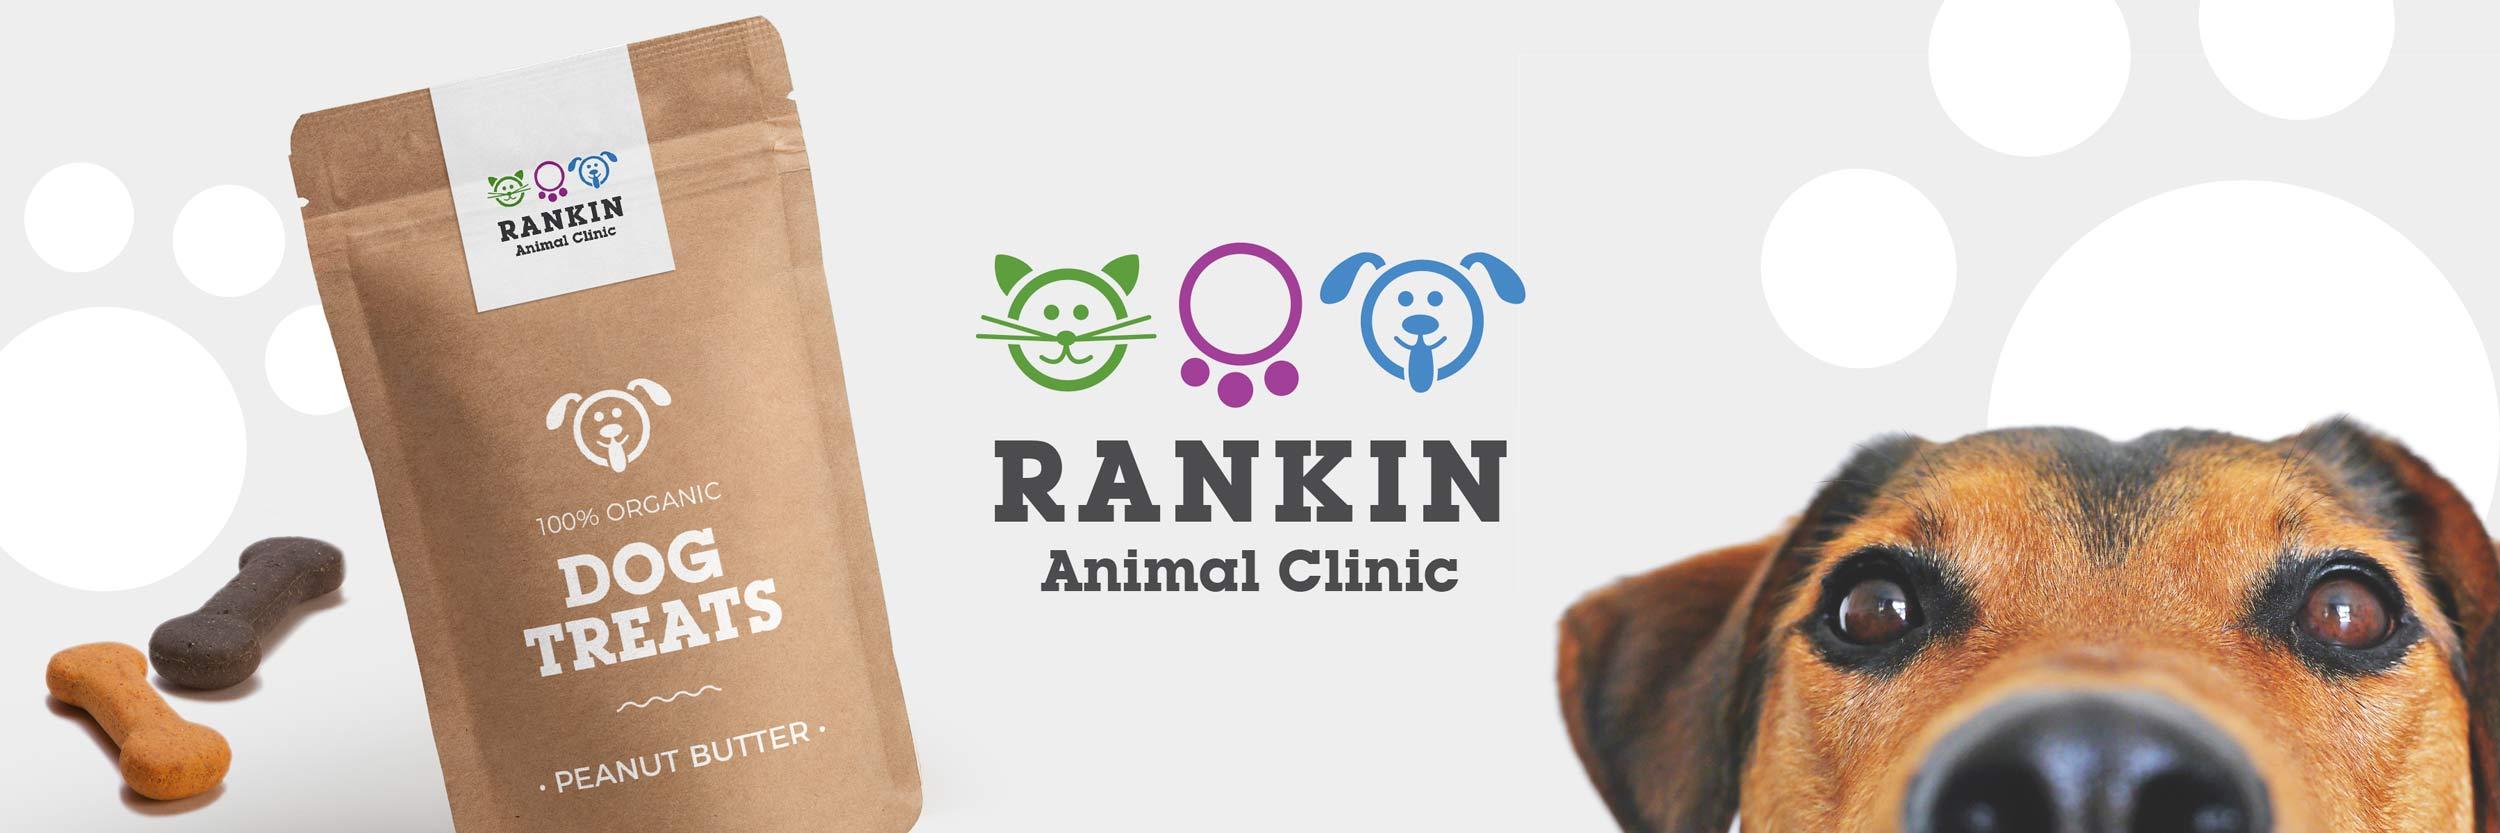 Rankin Animal Clinic